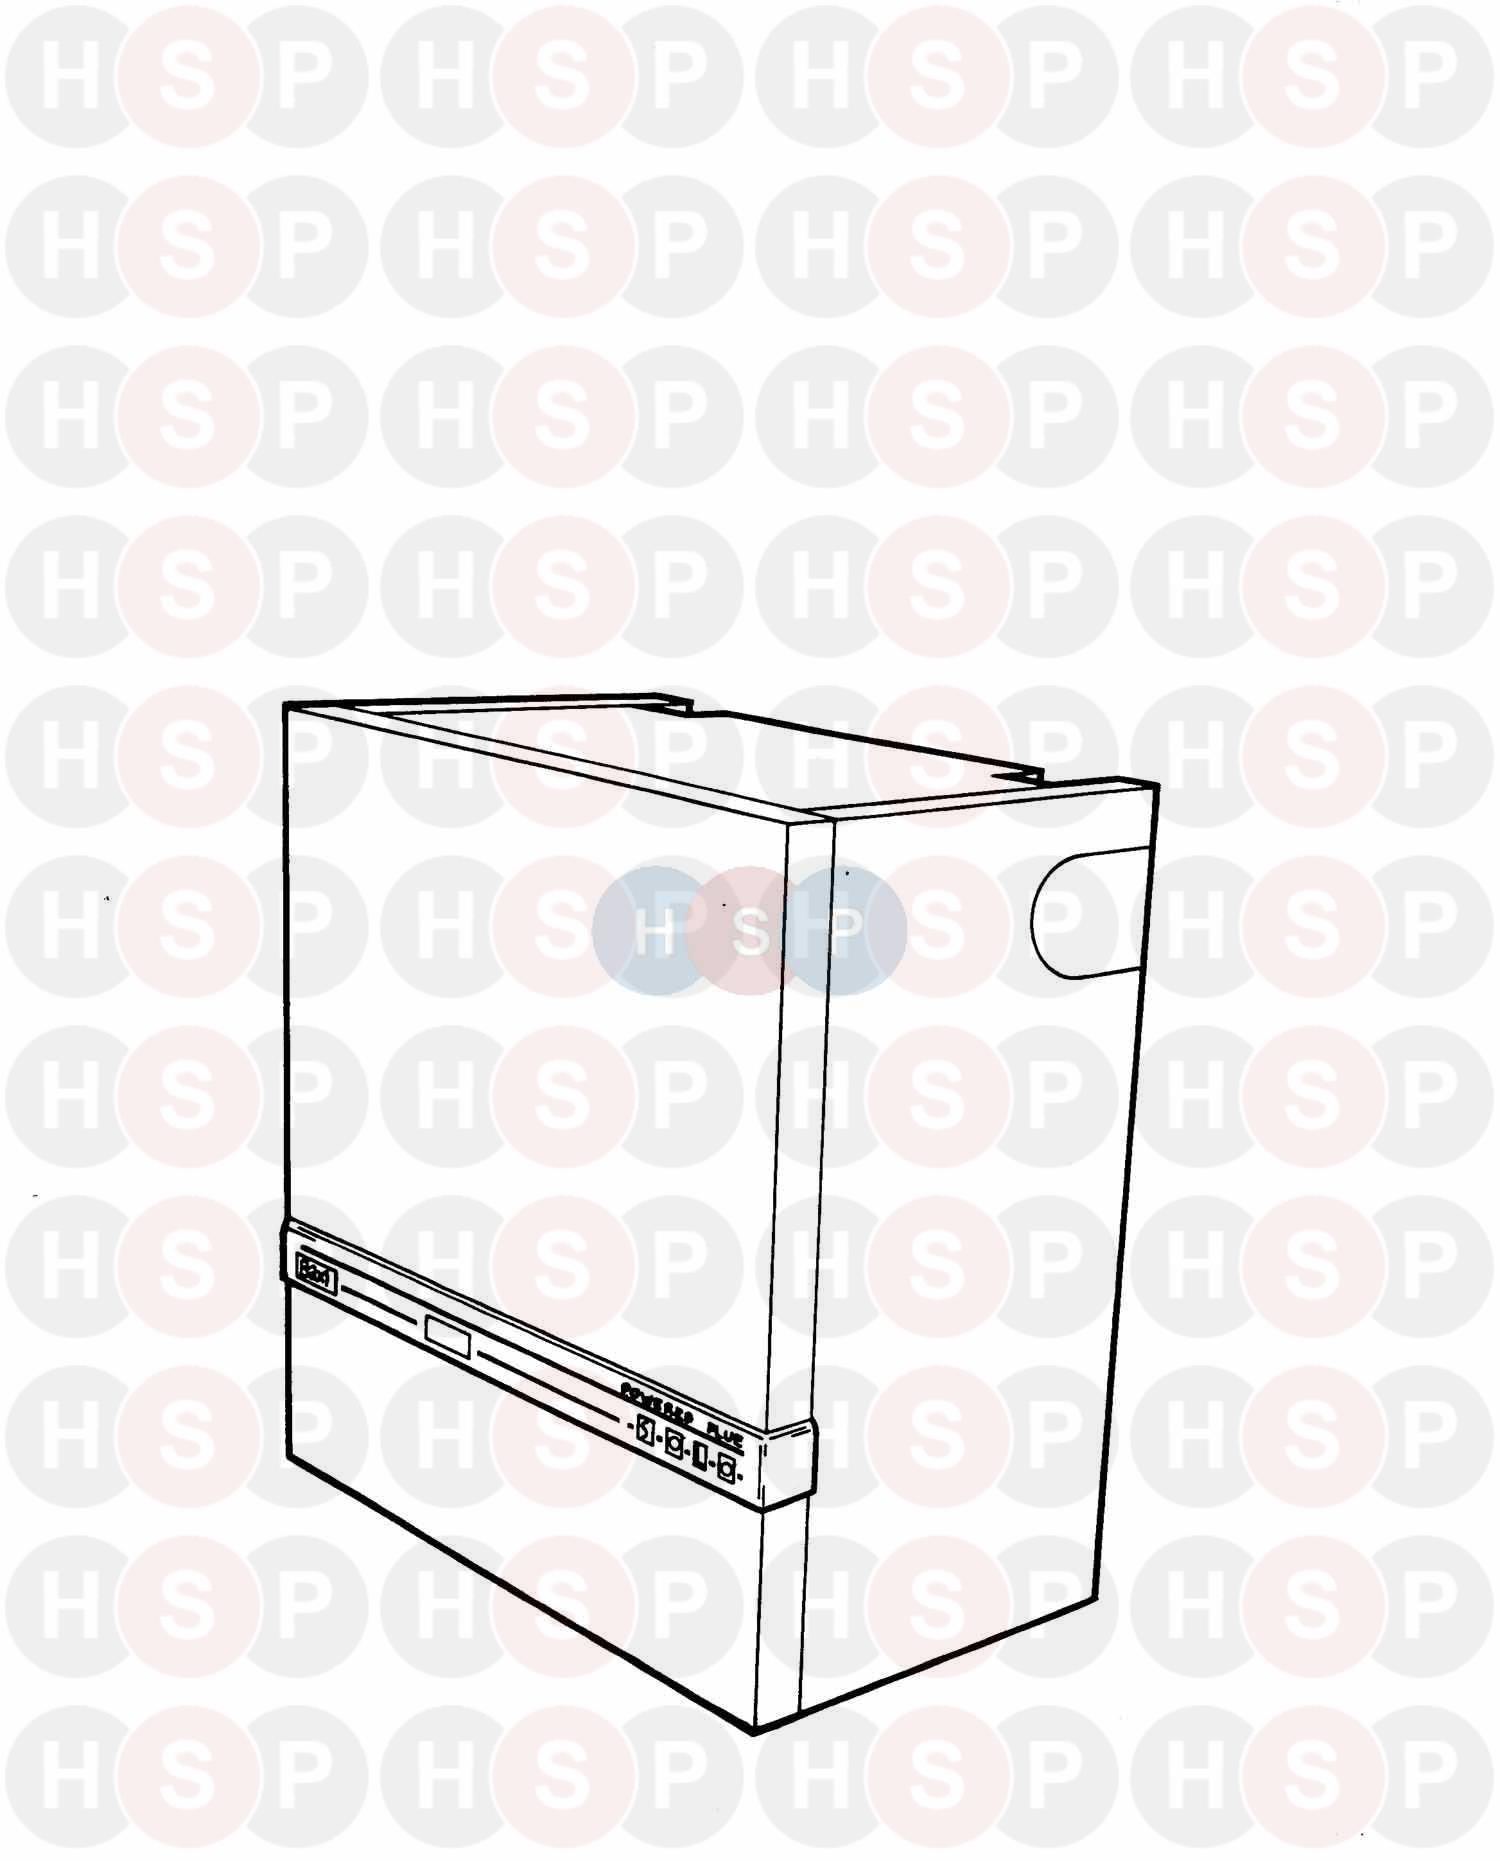 Baxi SOLO WM 70/4 PF (Appliance overview) Diagram